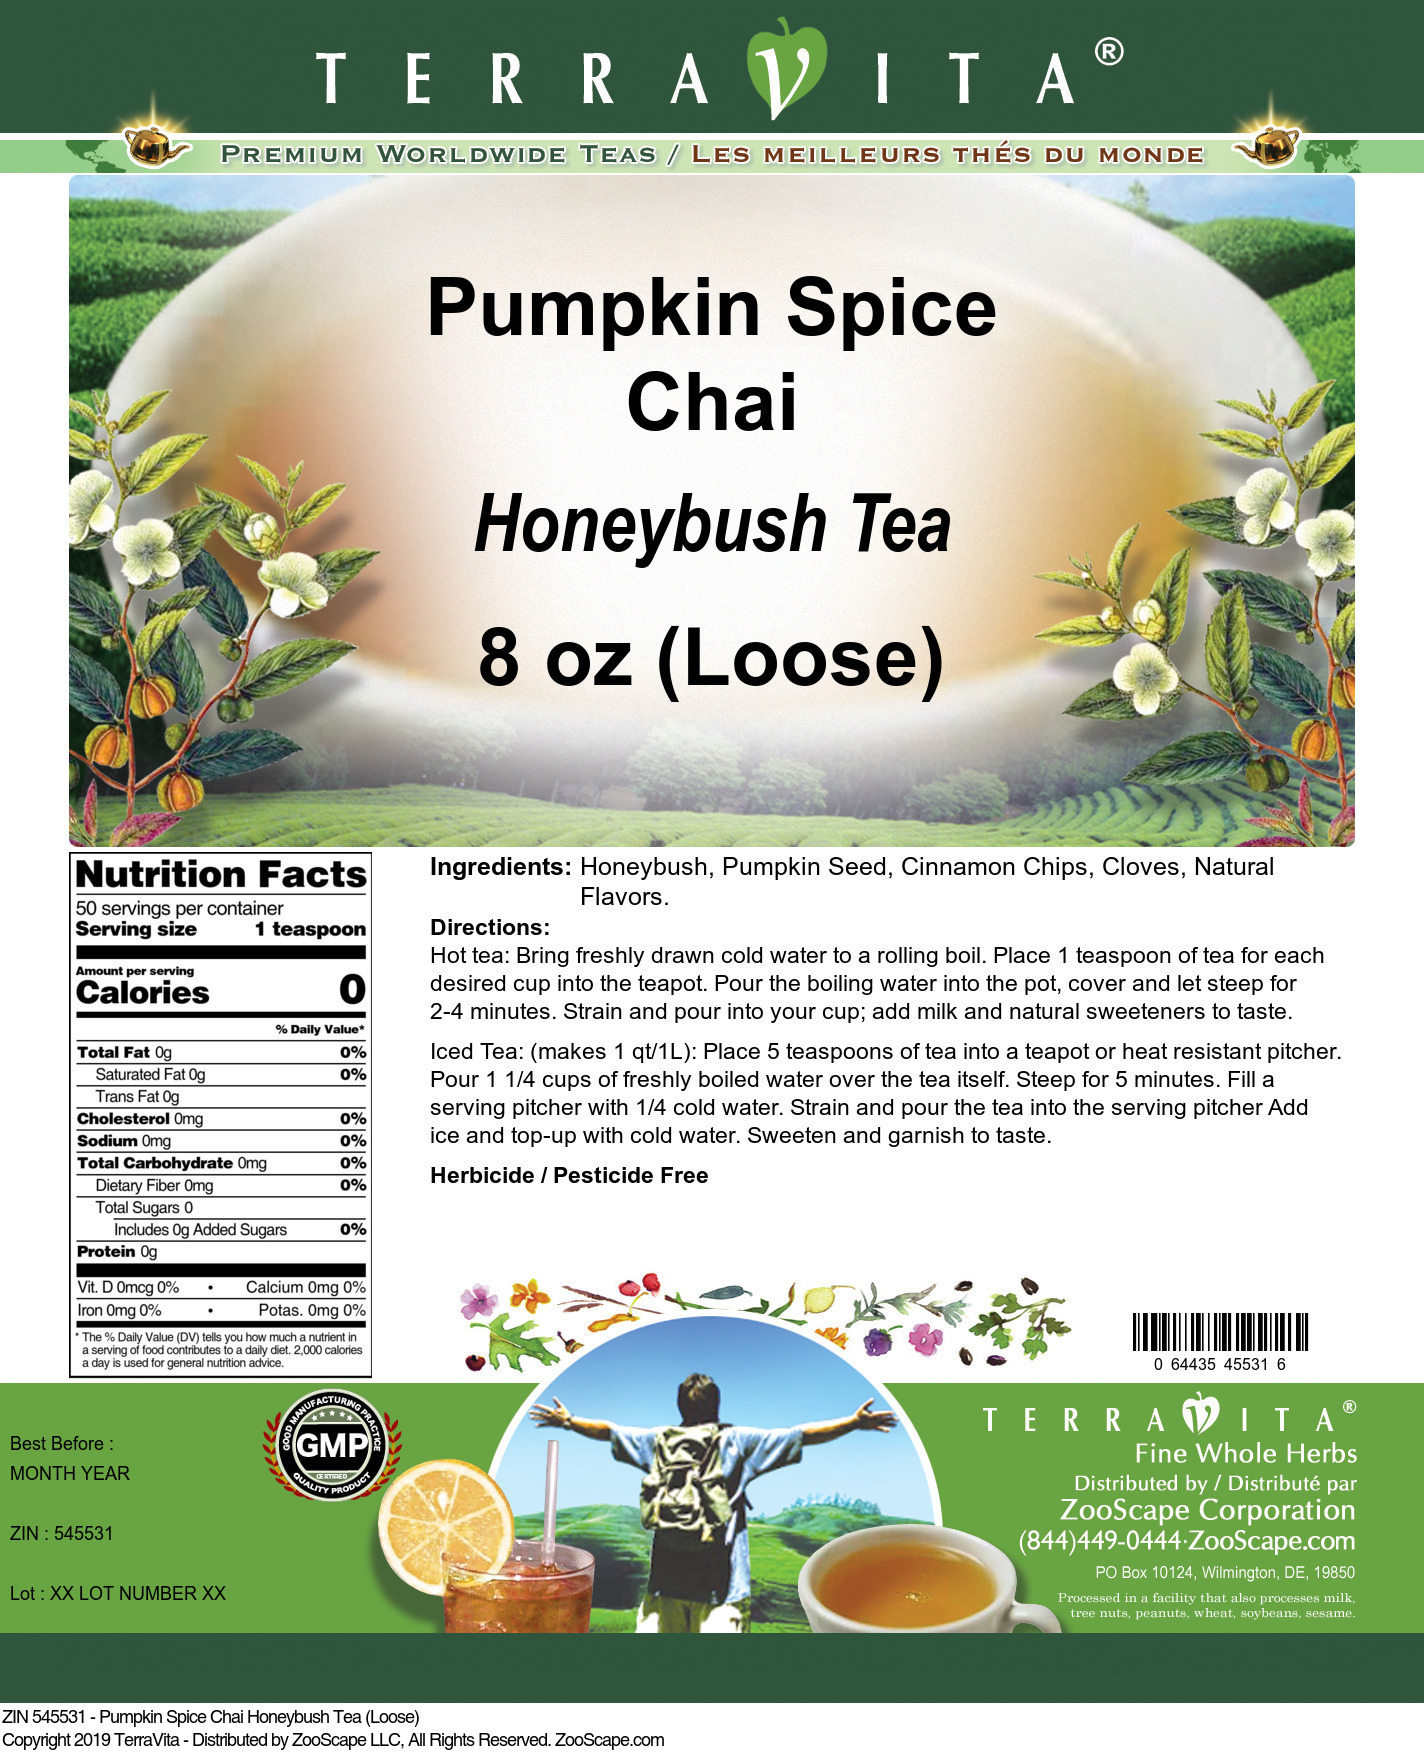 Pumpkin Spice Chai Honeybush Tea